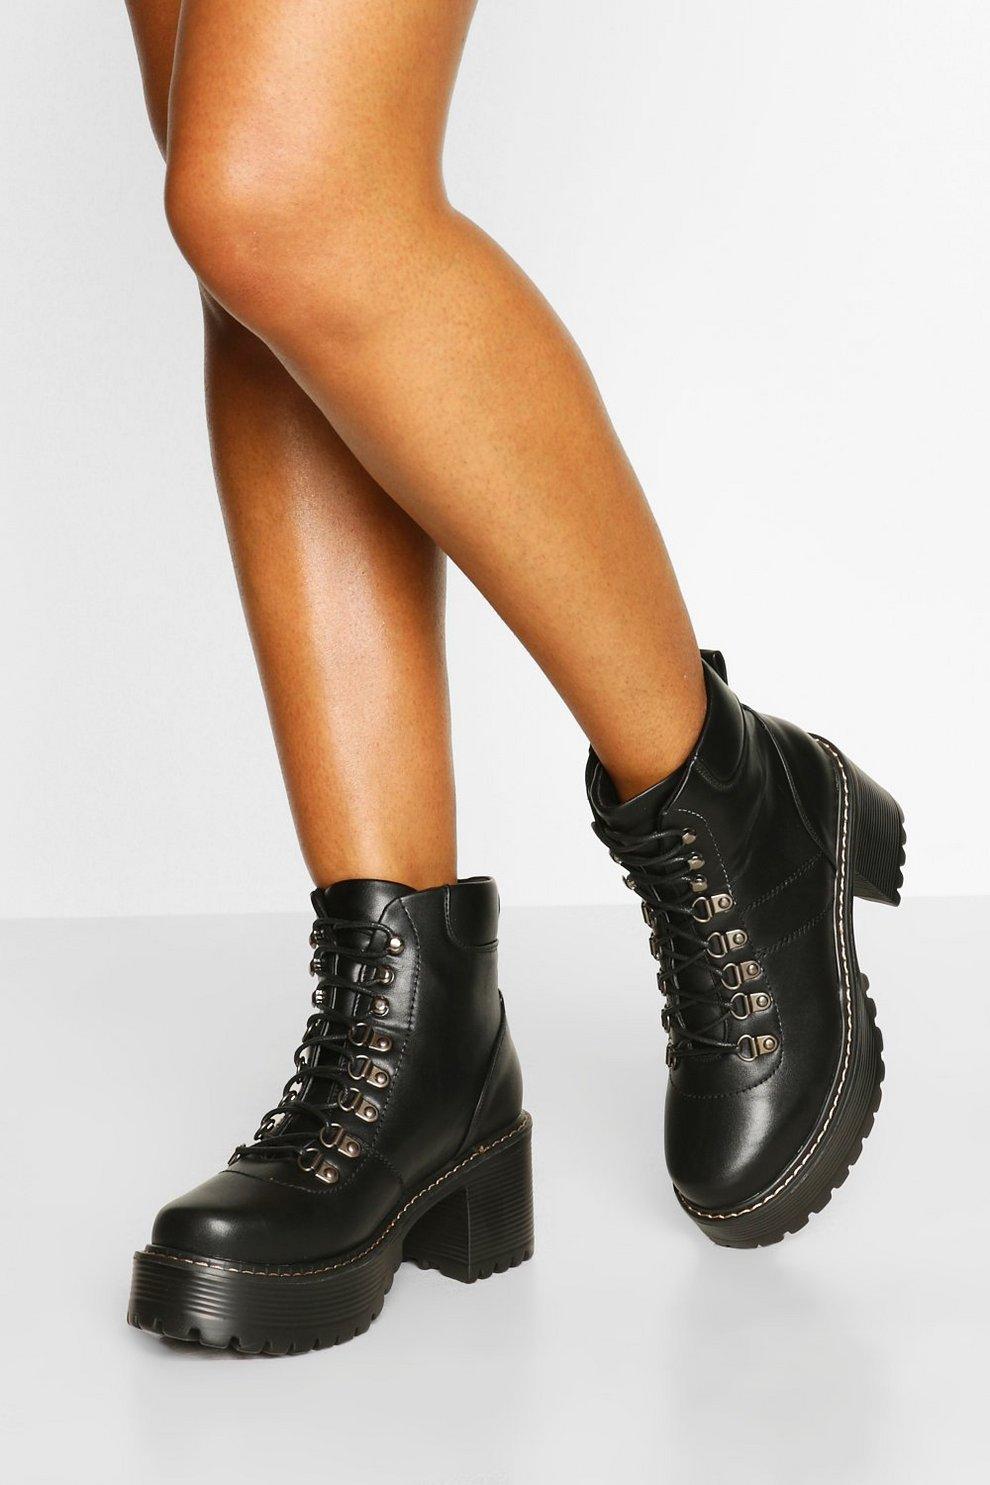 1385539bd51c9 Womens Black Chunky Platform Block Heel Hiker Boots